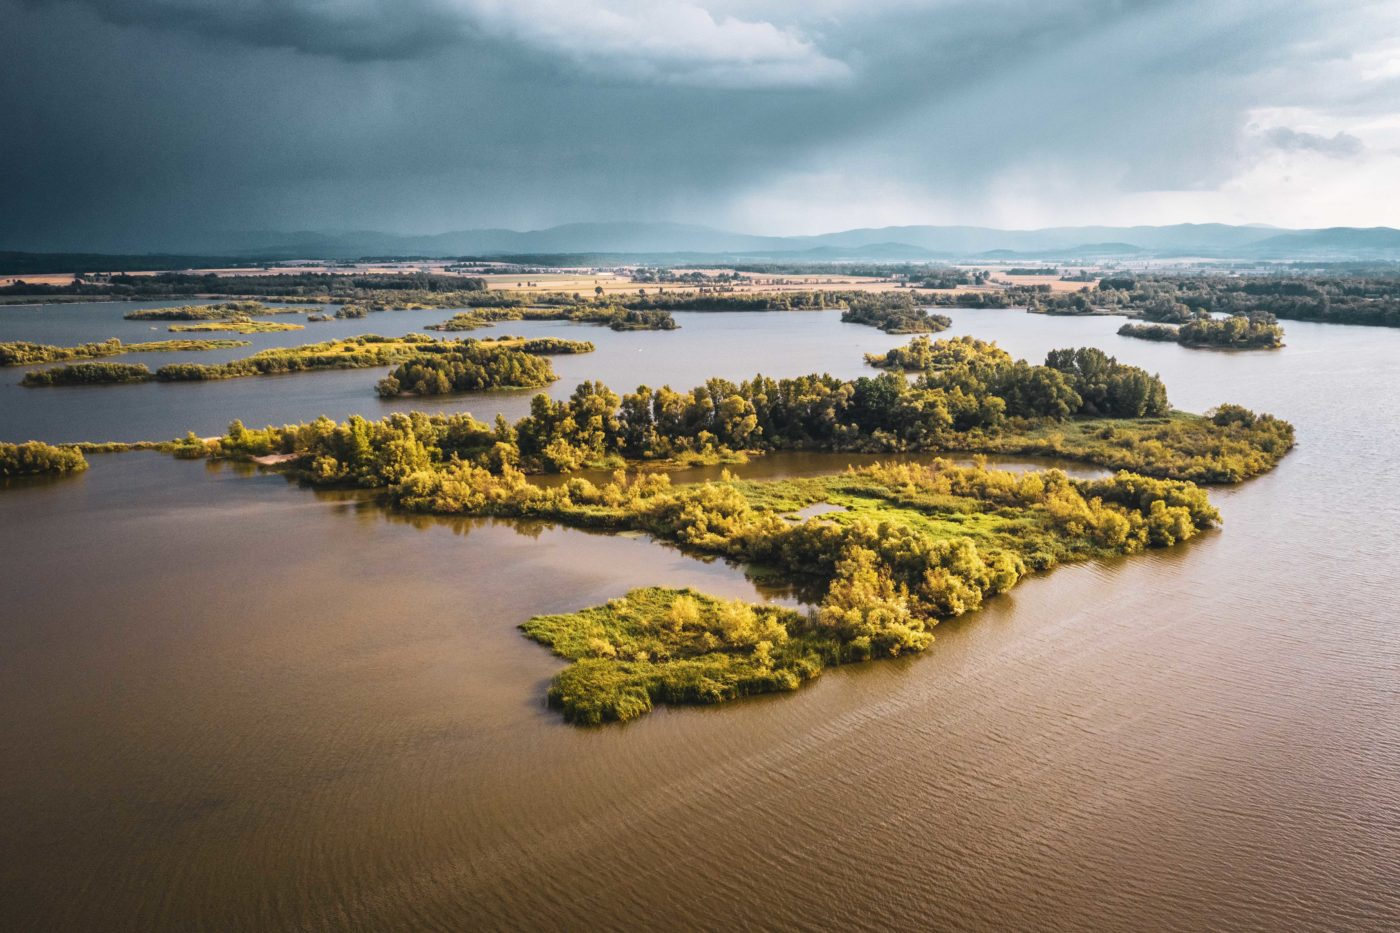 jezioro Nyskie, mořské kajaky, Polsko